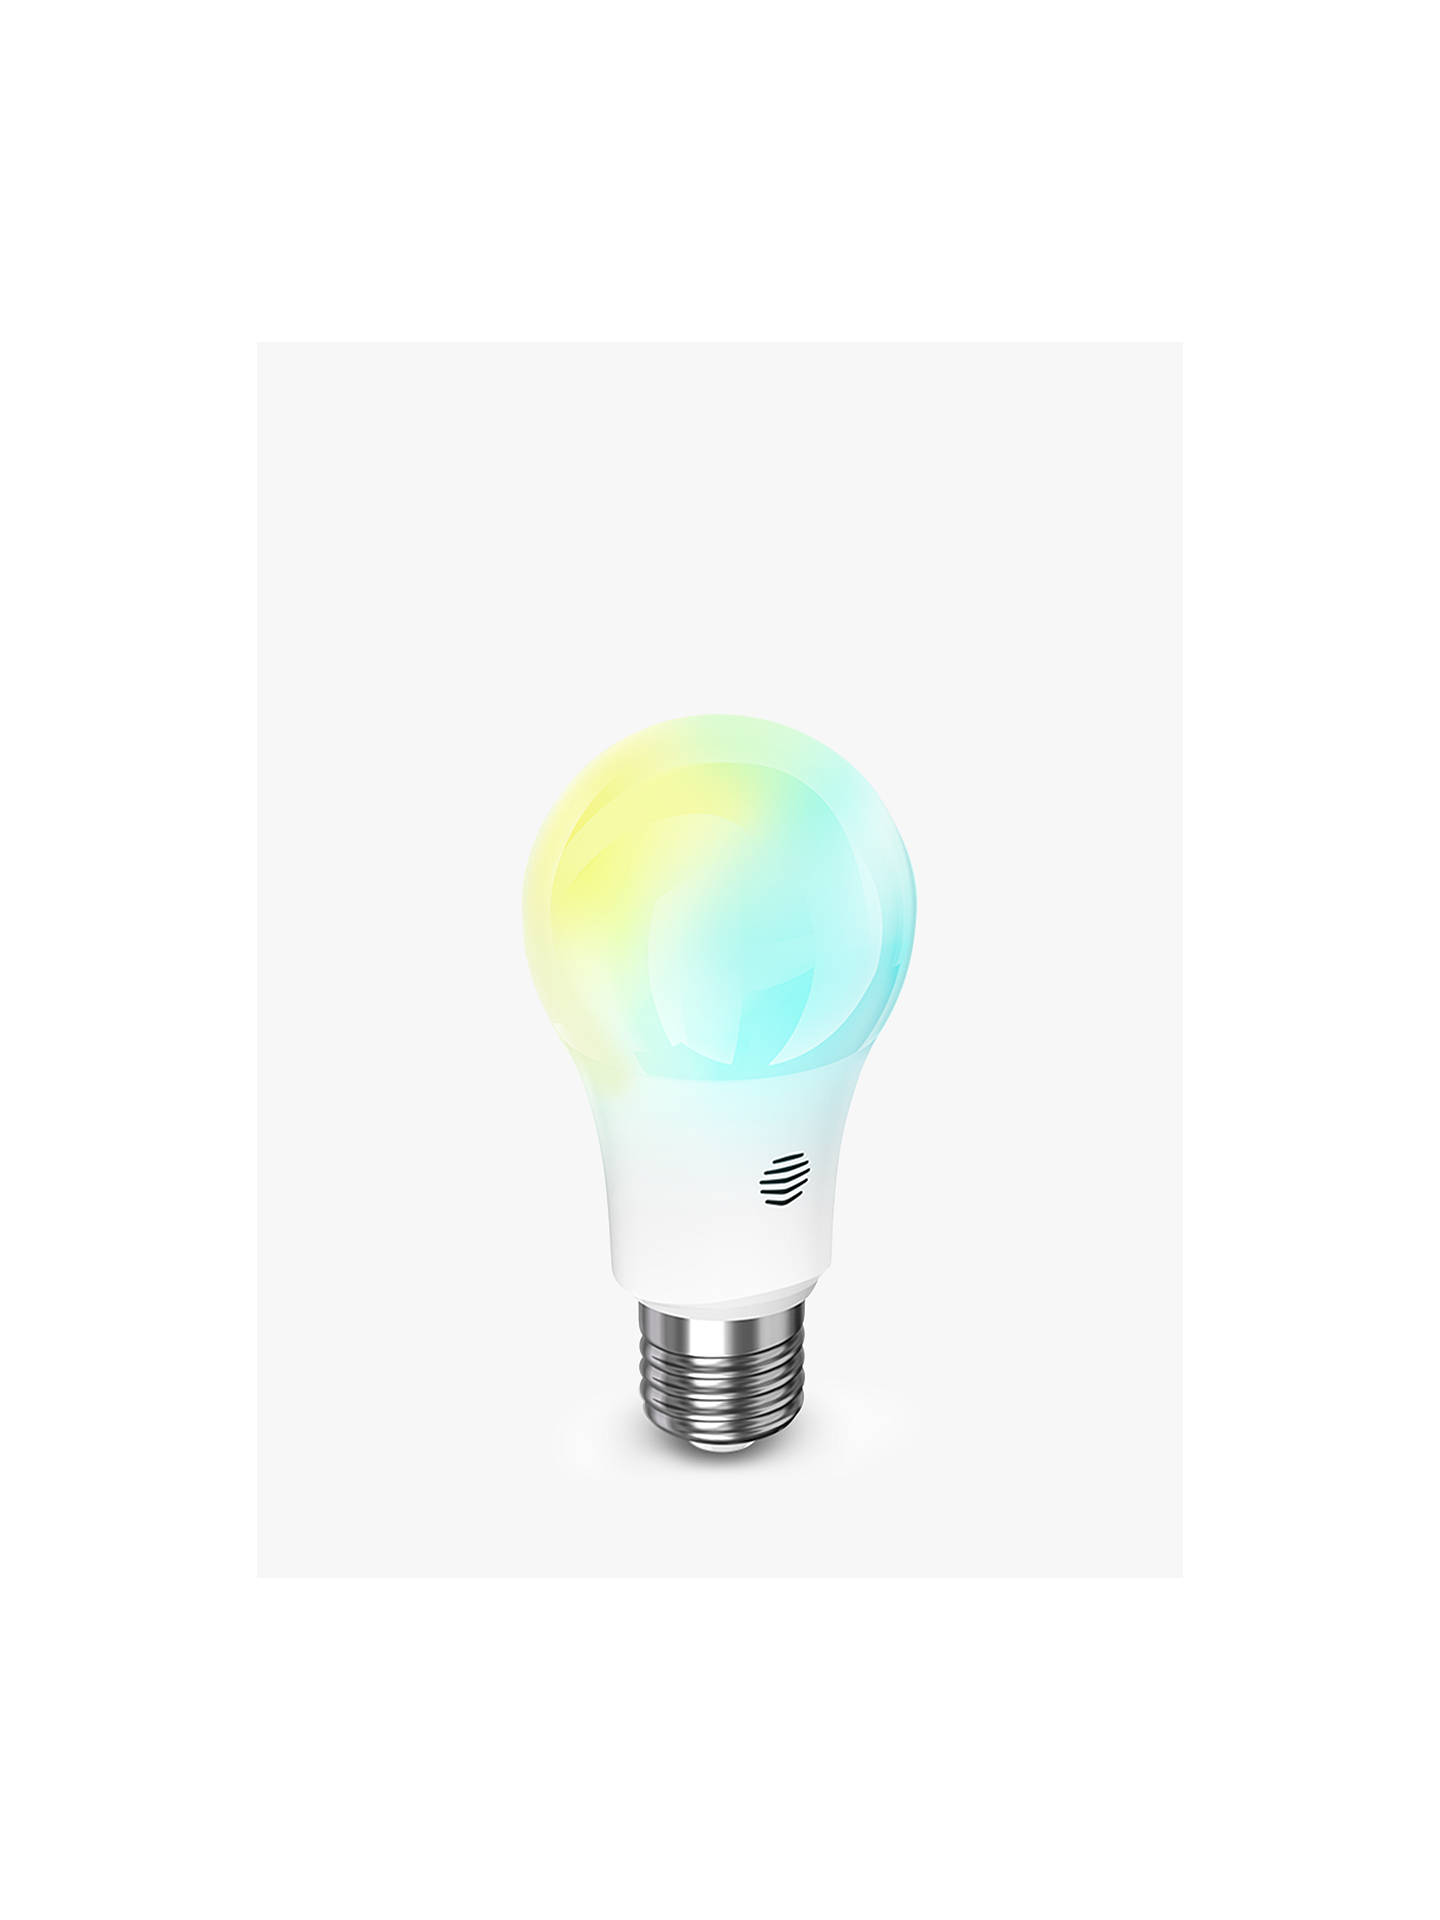 edison effect in light bulbs